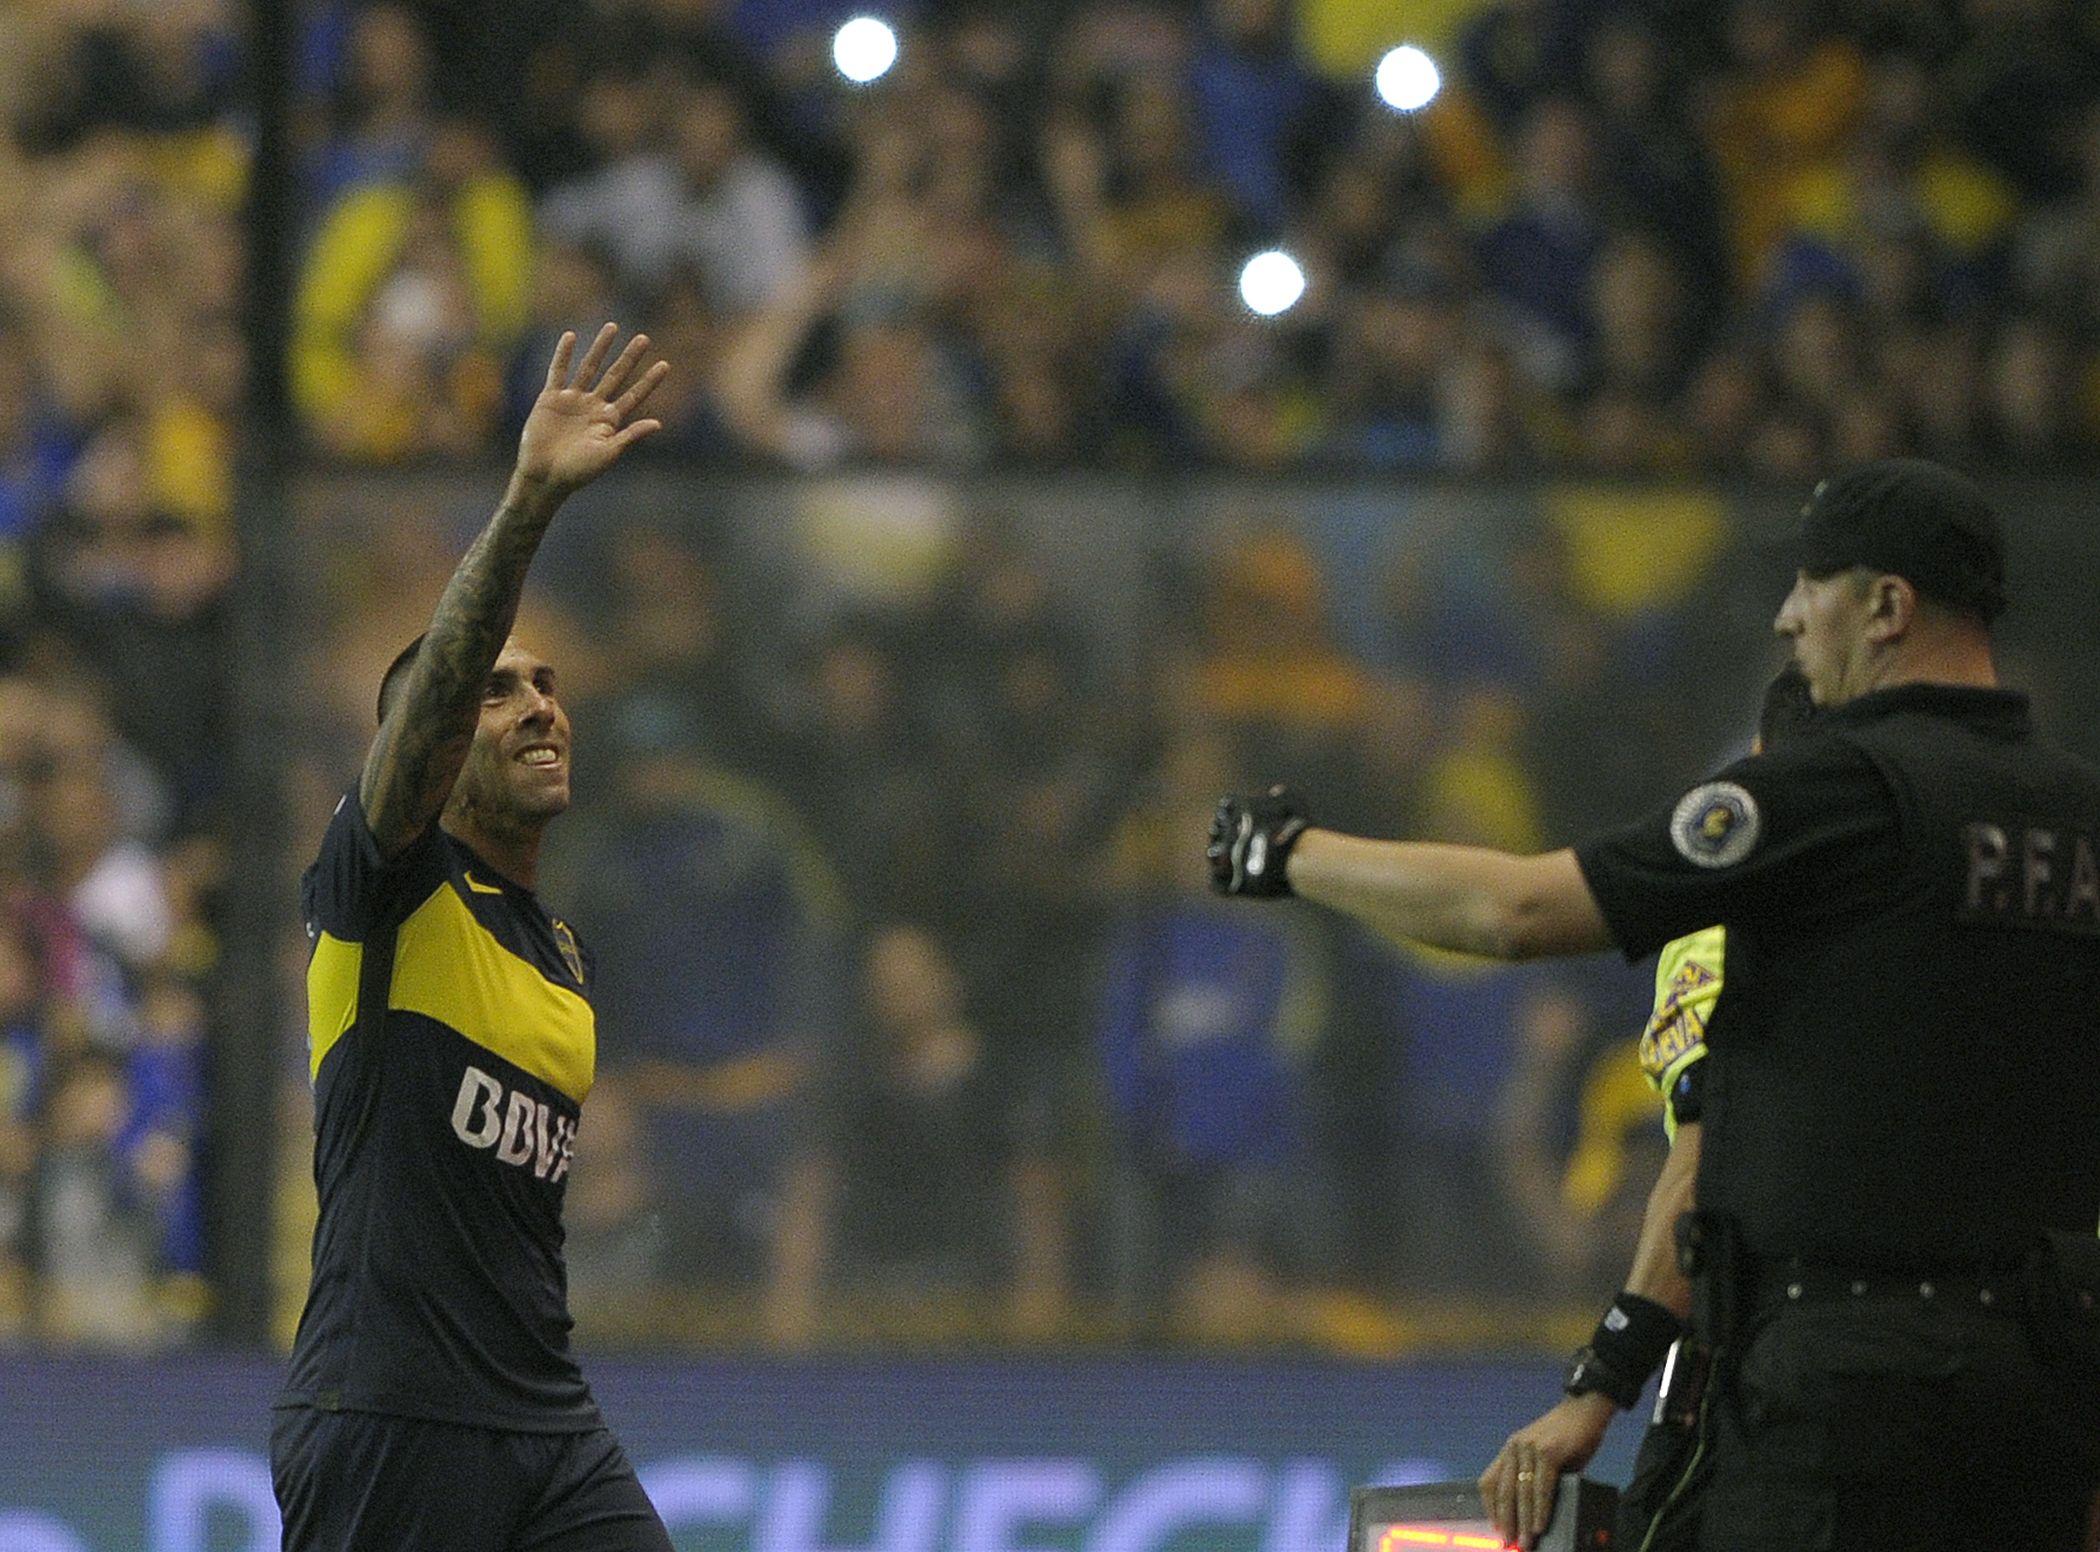 Argentinian striker Carlos Tevez